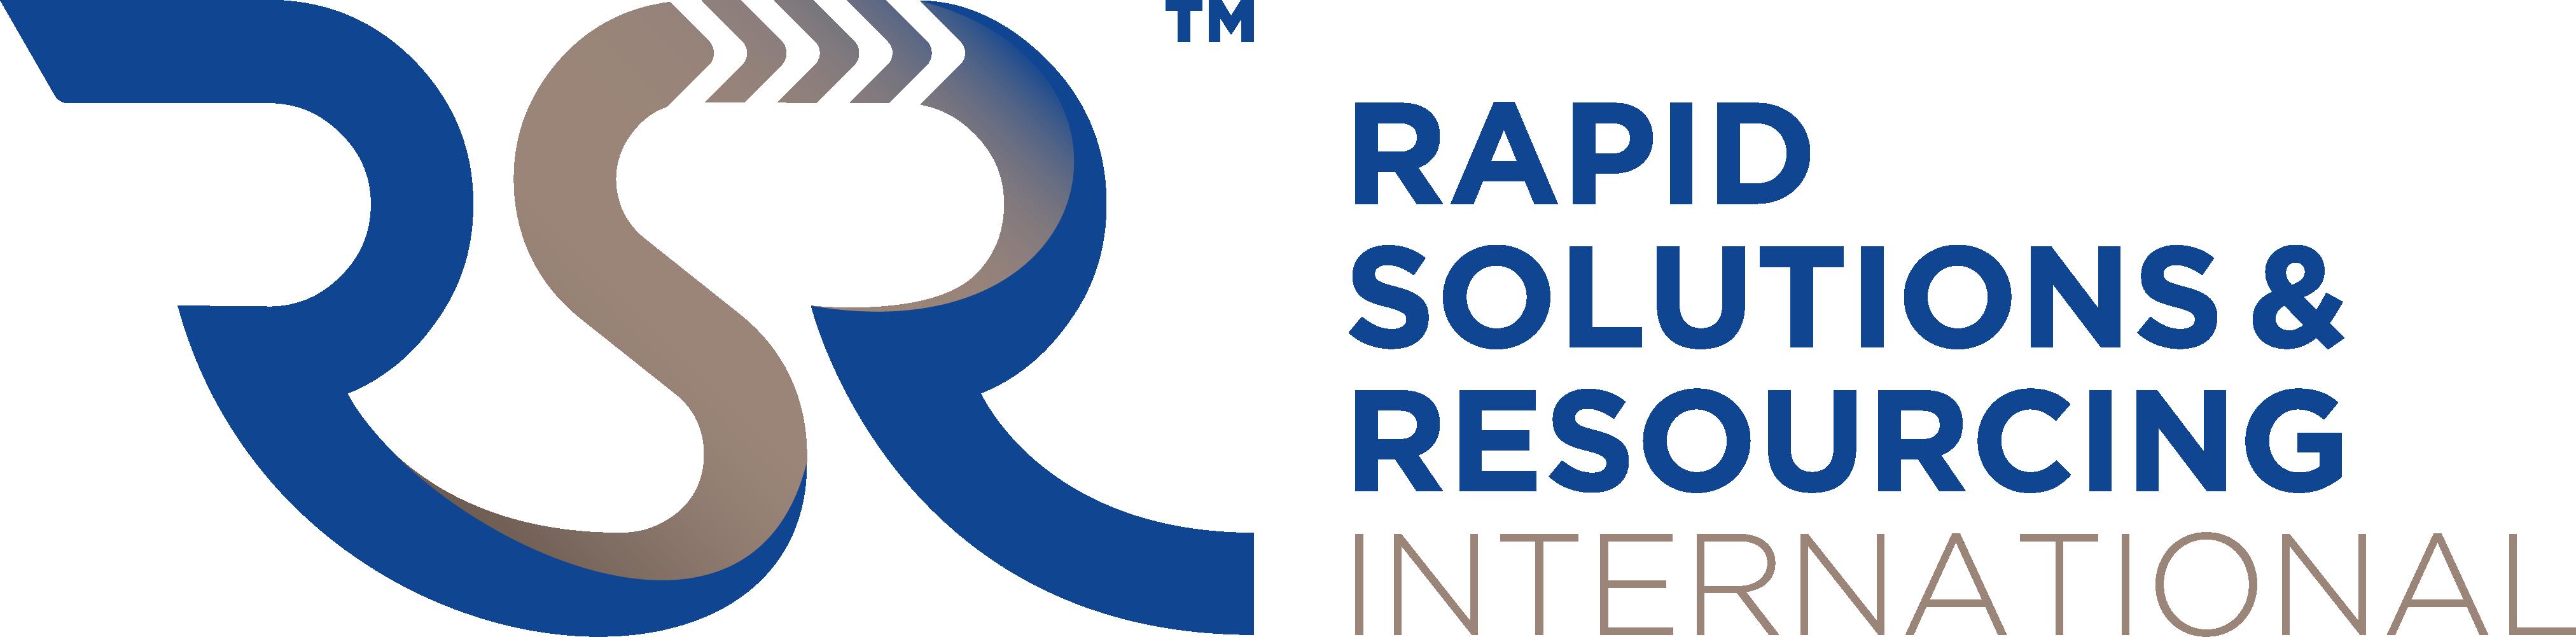 SAP Solution - SAP Rapid Solution - SAP Resourcing - RSR International